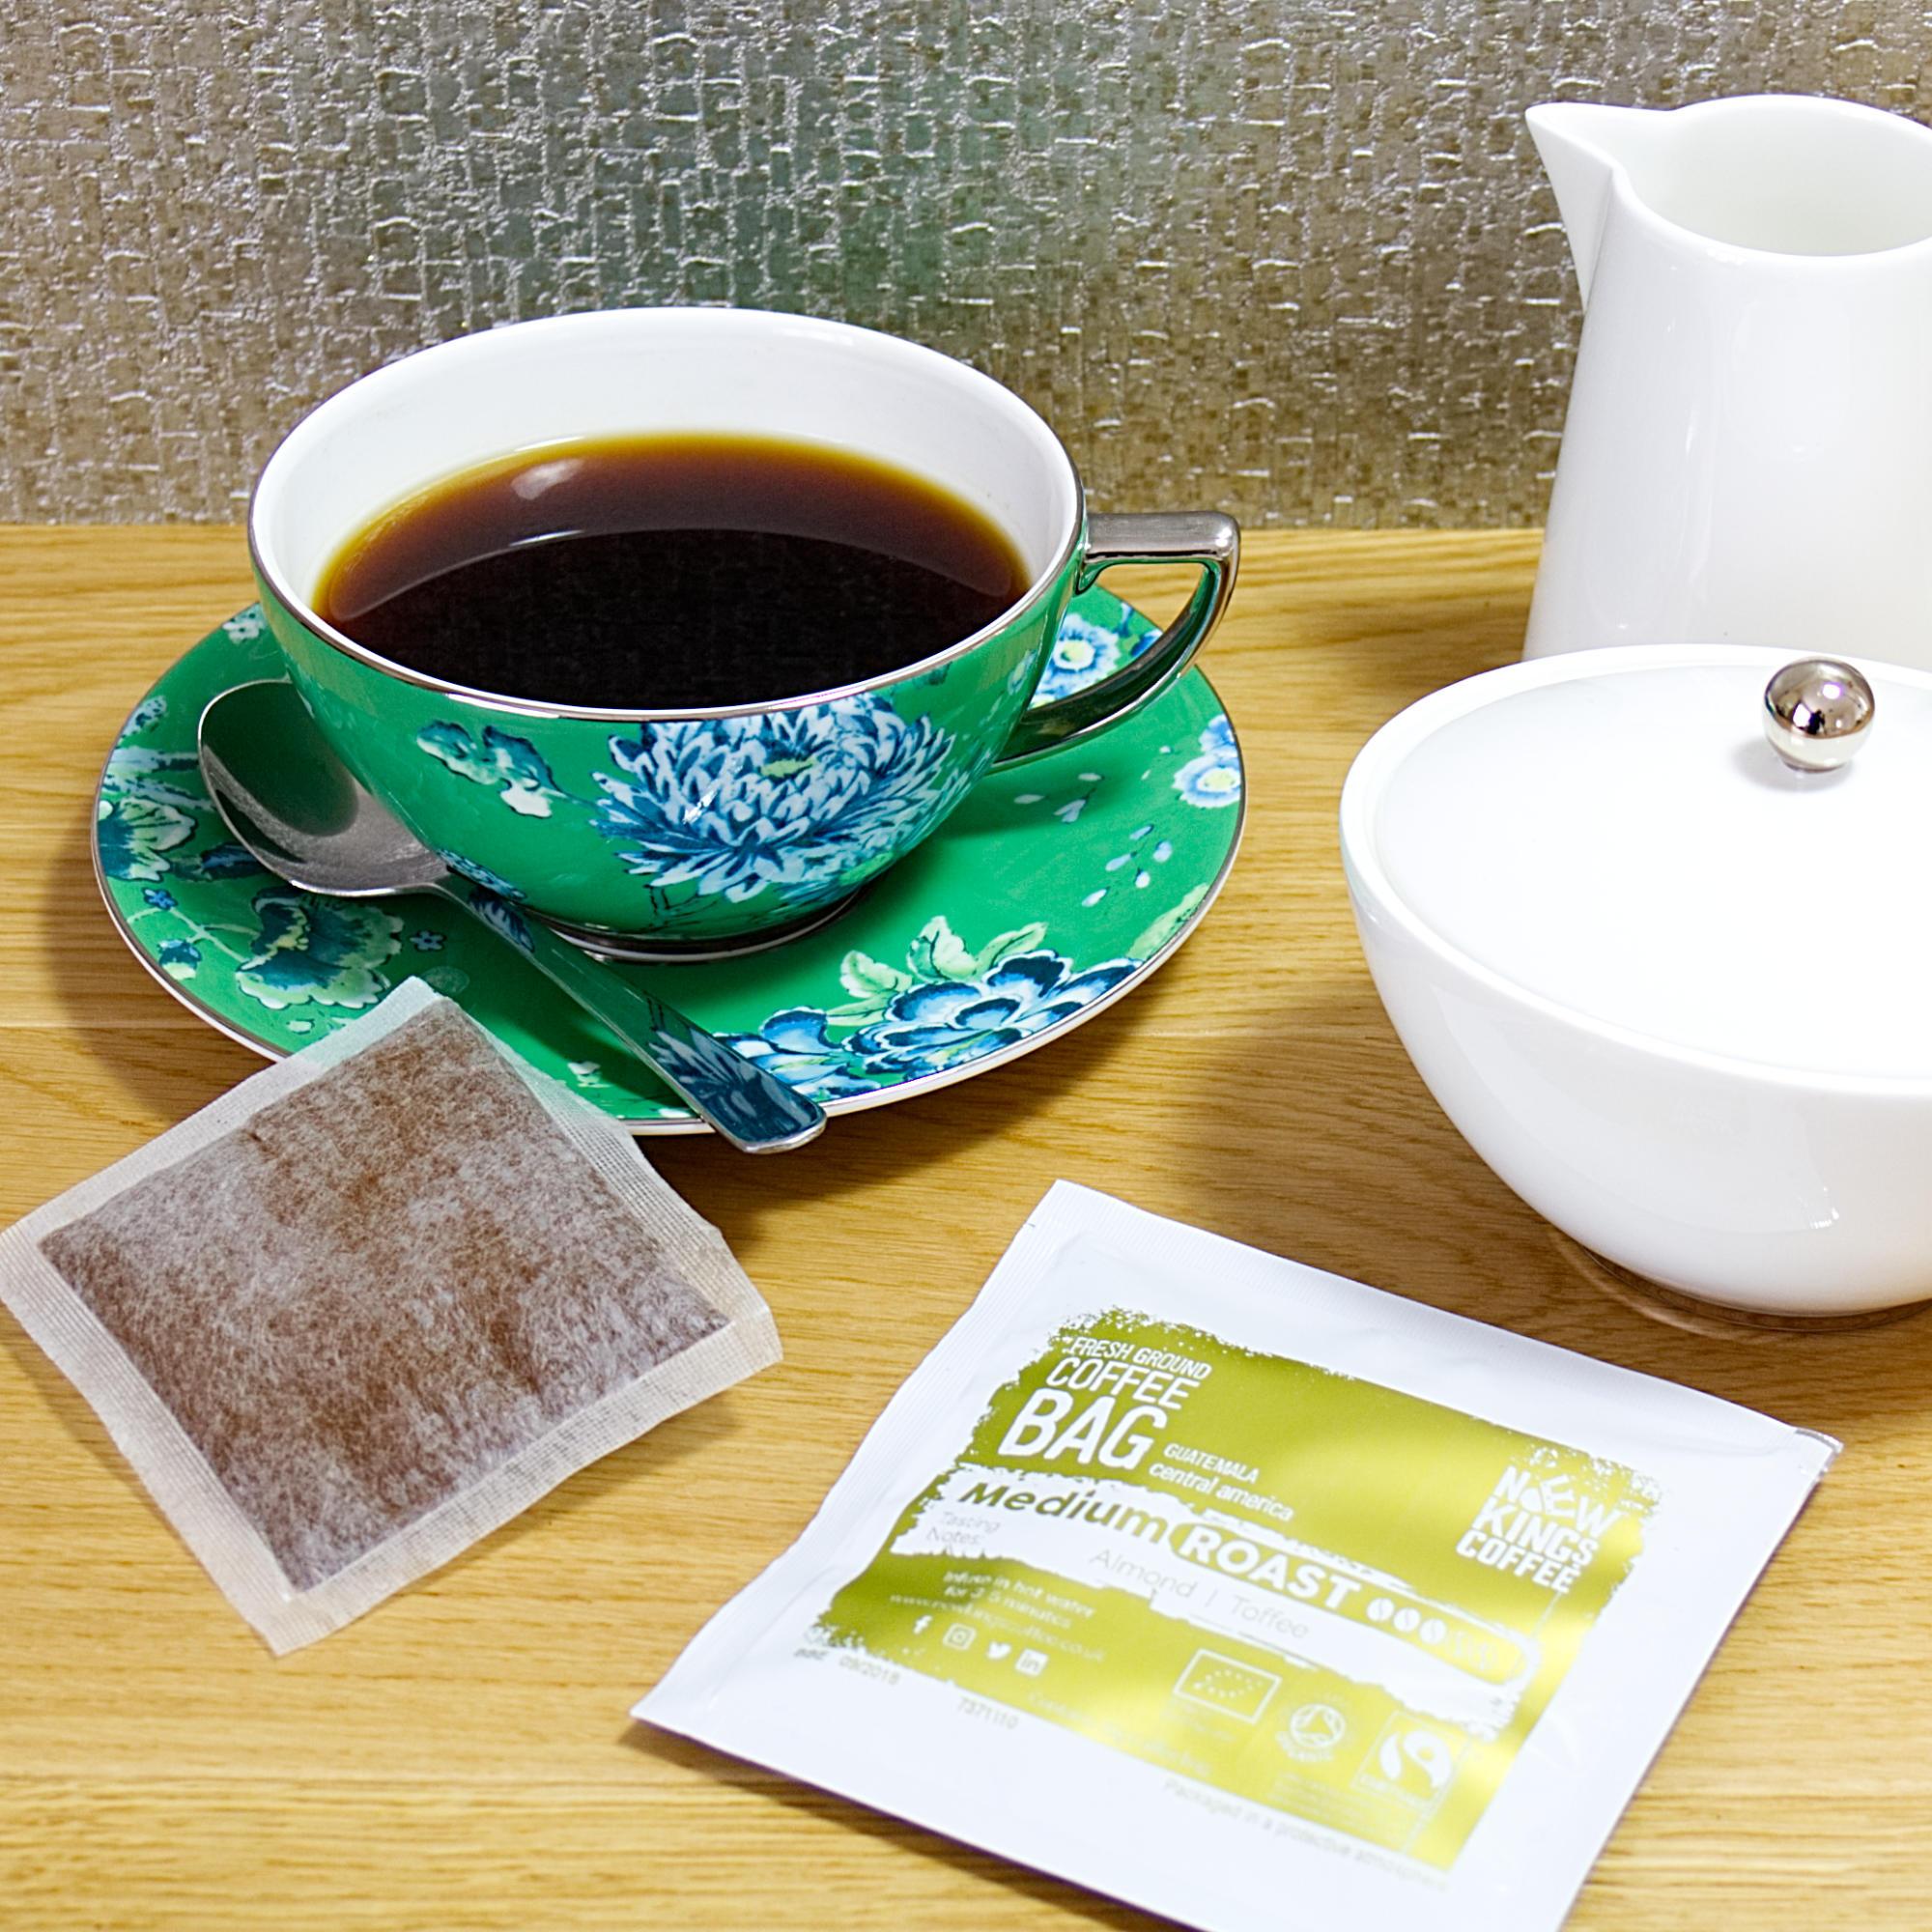 New-Kings-Coffee-Bags-Fairtrade-Organic-Guatemala-with-milk-and-sugar-square.jpg